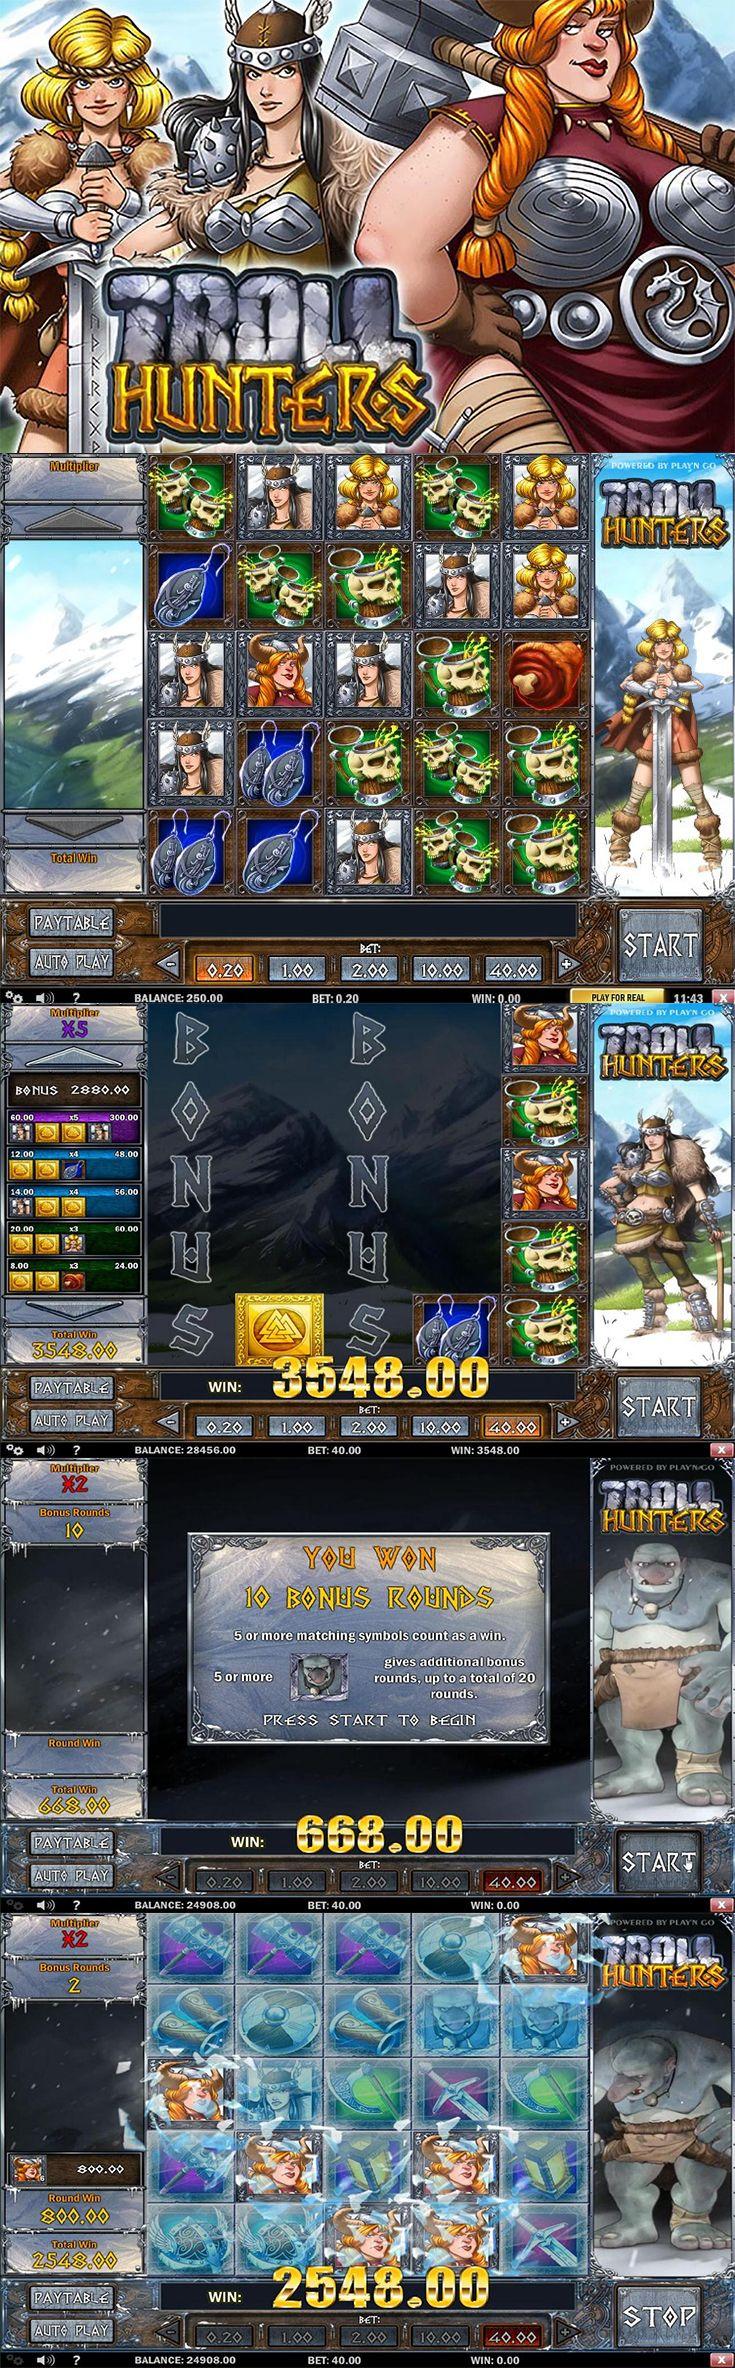 slot games that earn rewards